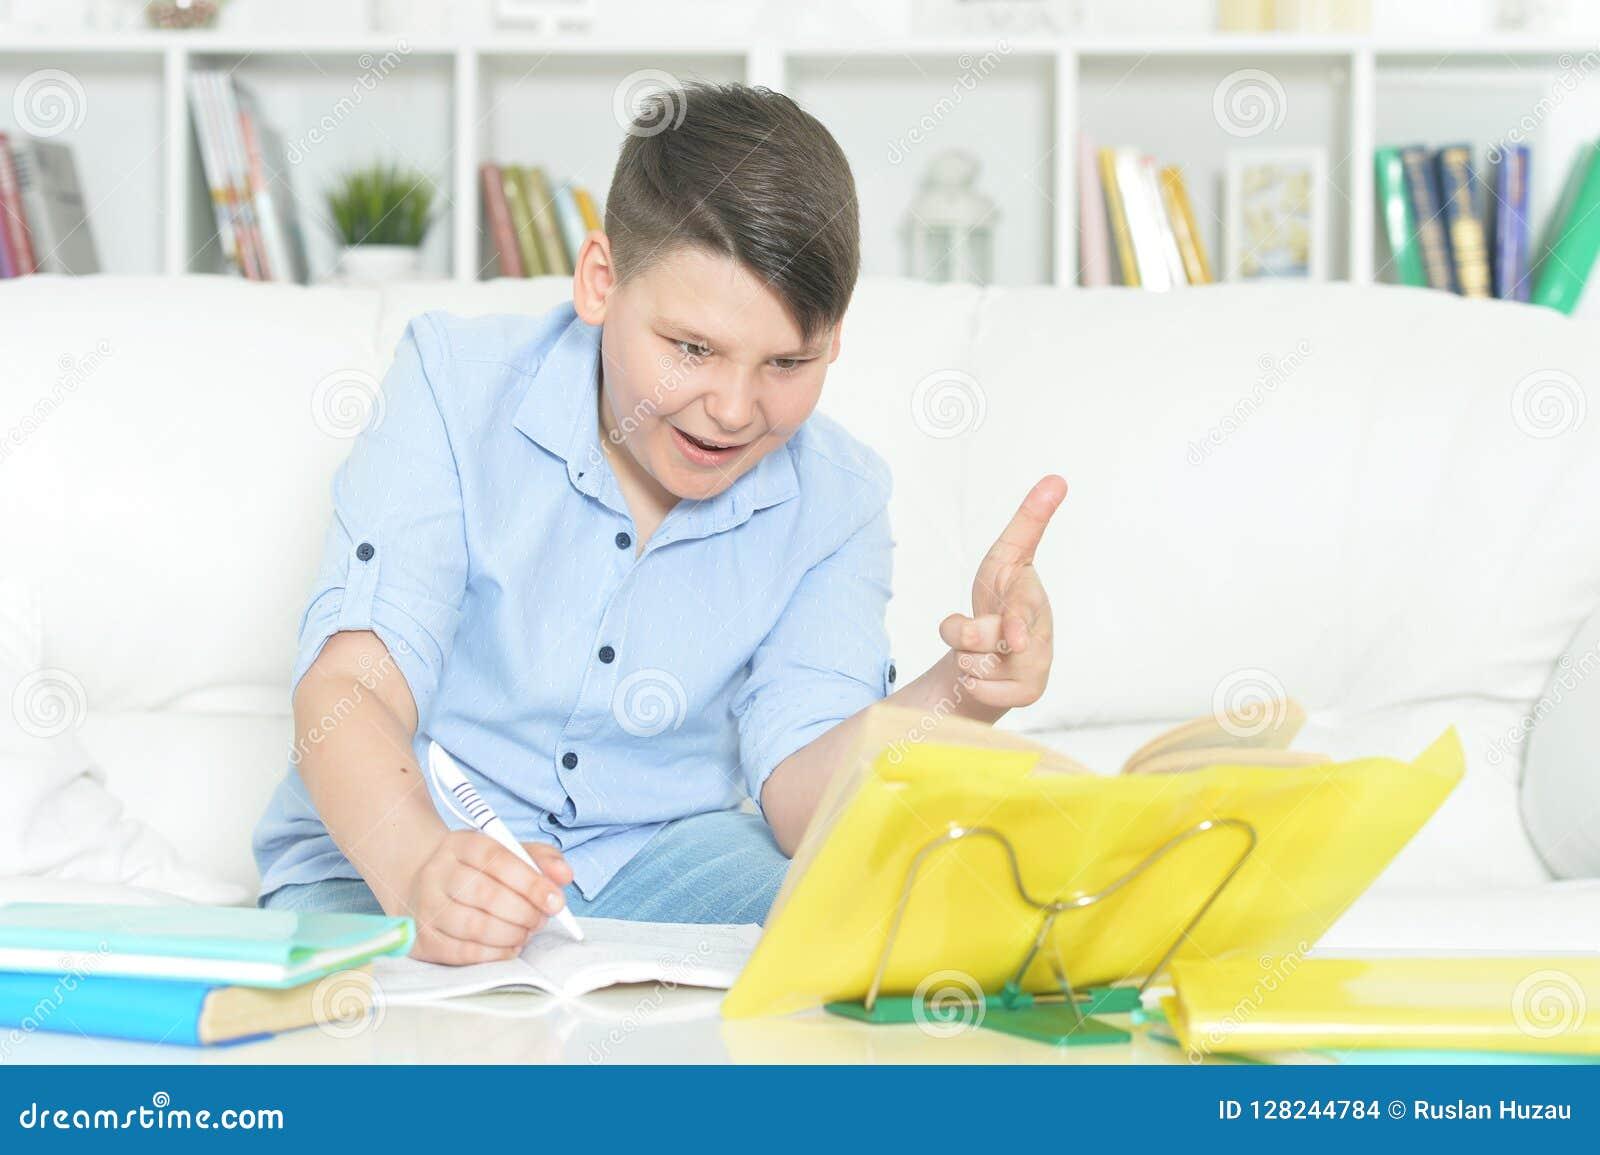 portrait of boy doing homework at home stock photo image of rh dreamstime com Doing Math Homework Boy Doing His Homework